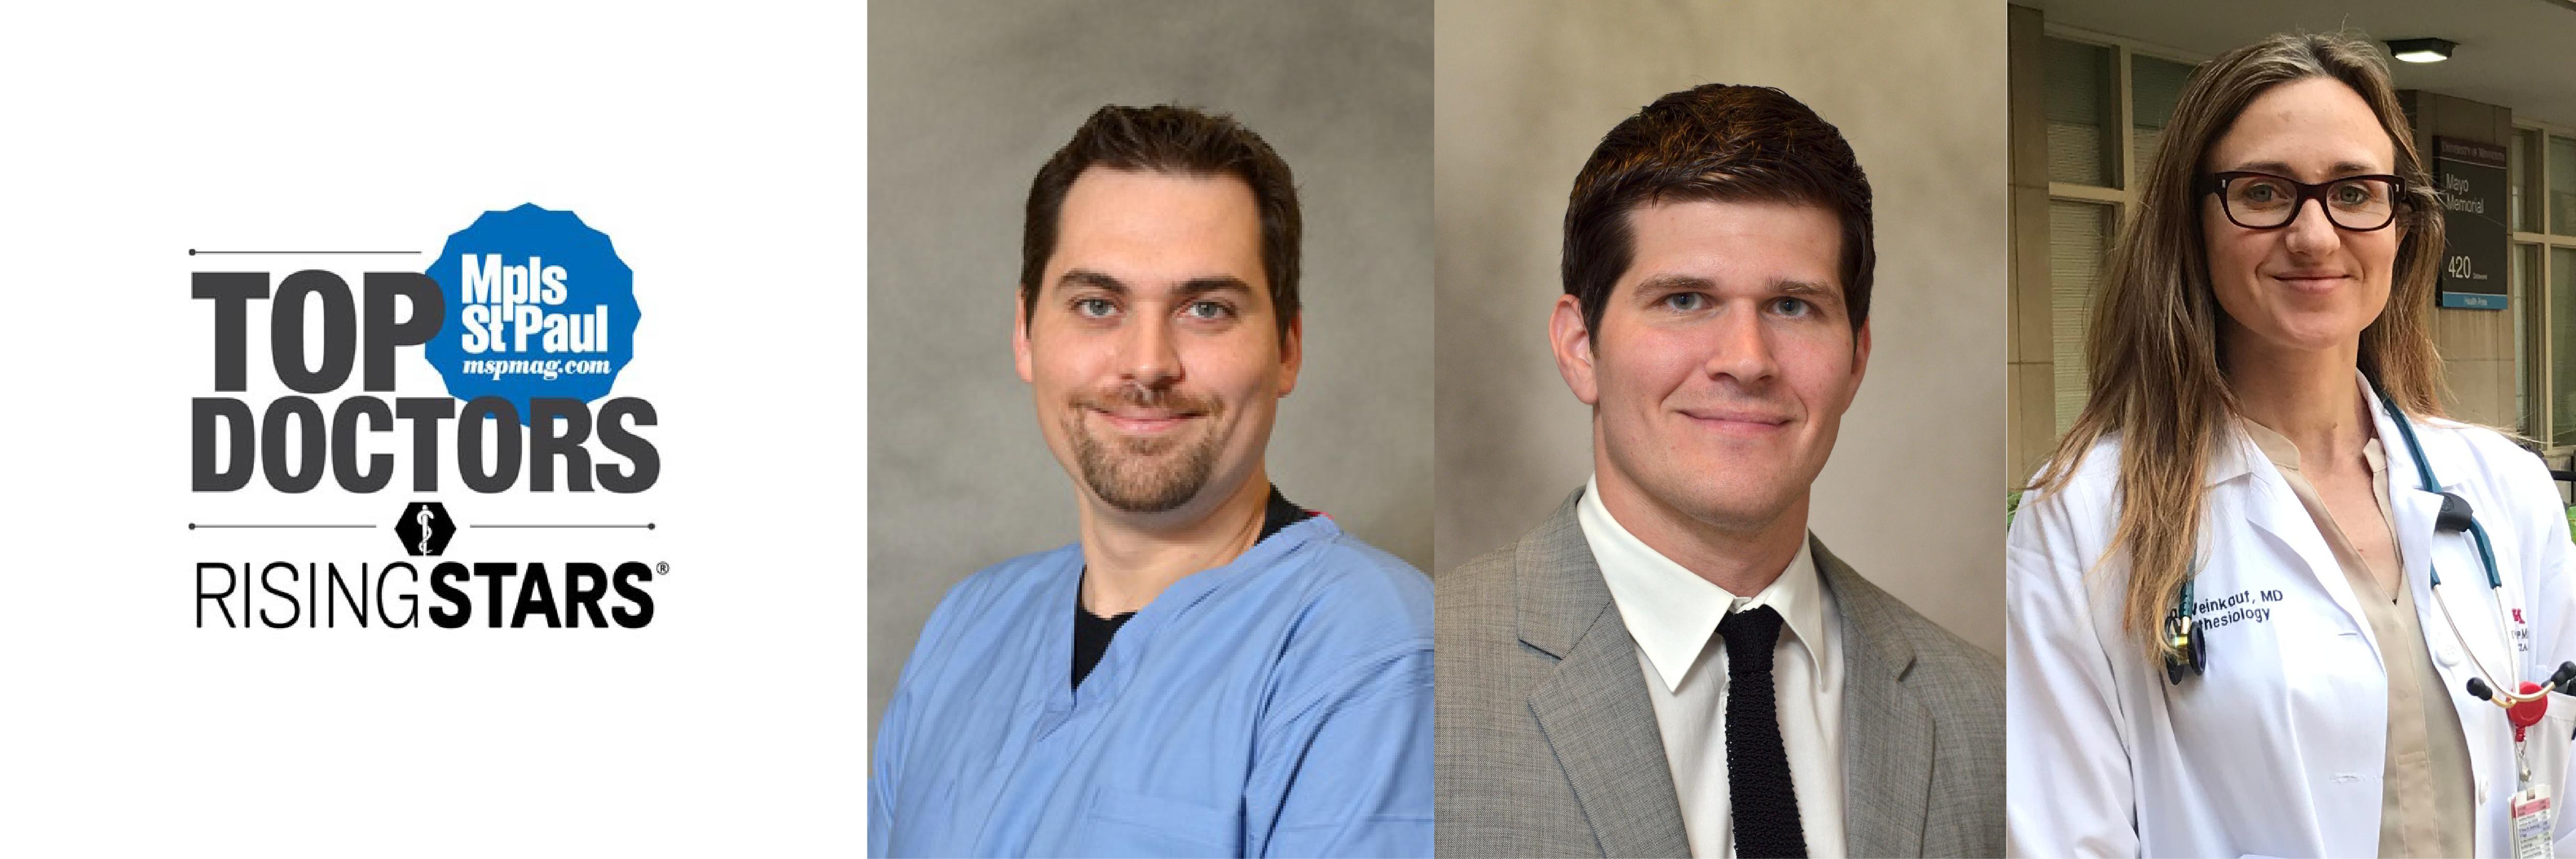 rising stars doctors